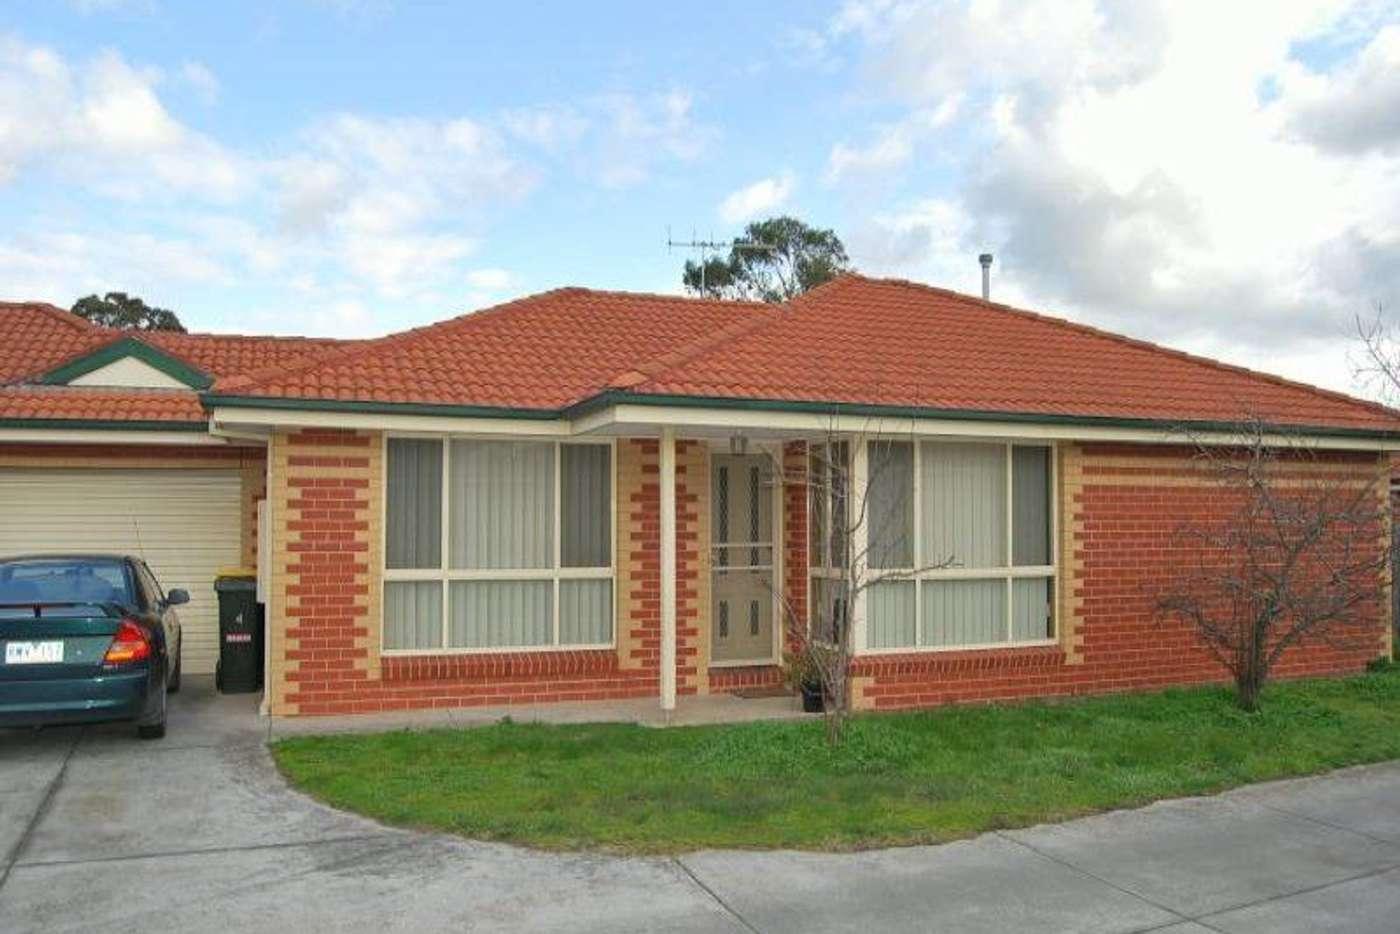 Main view of Homely unit listing, 4/272 Albert Street, Sebastopol VIC 3356